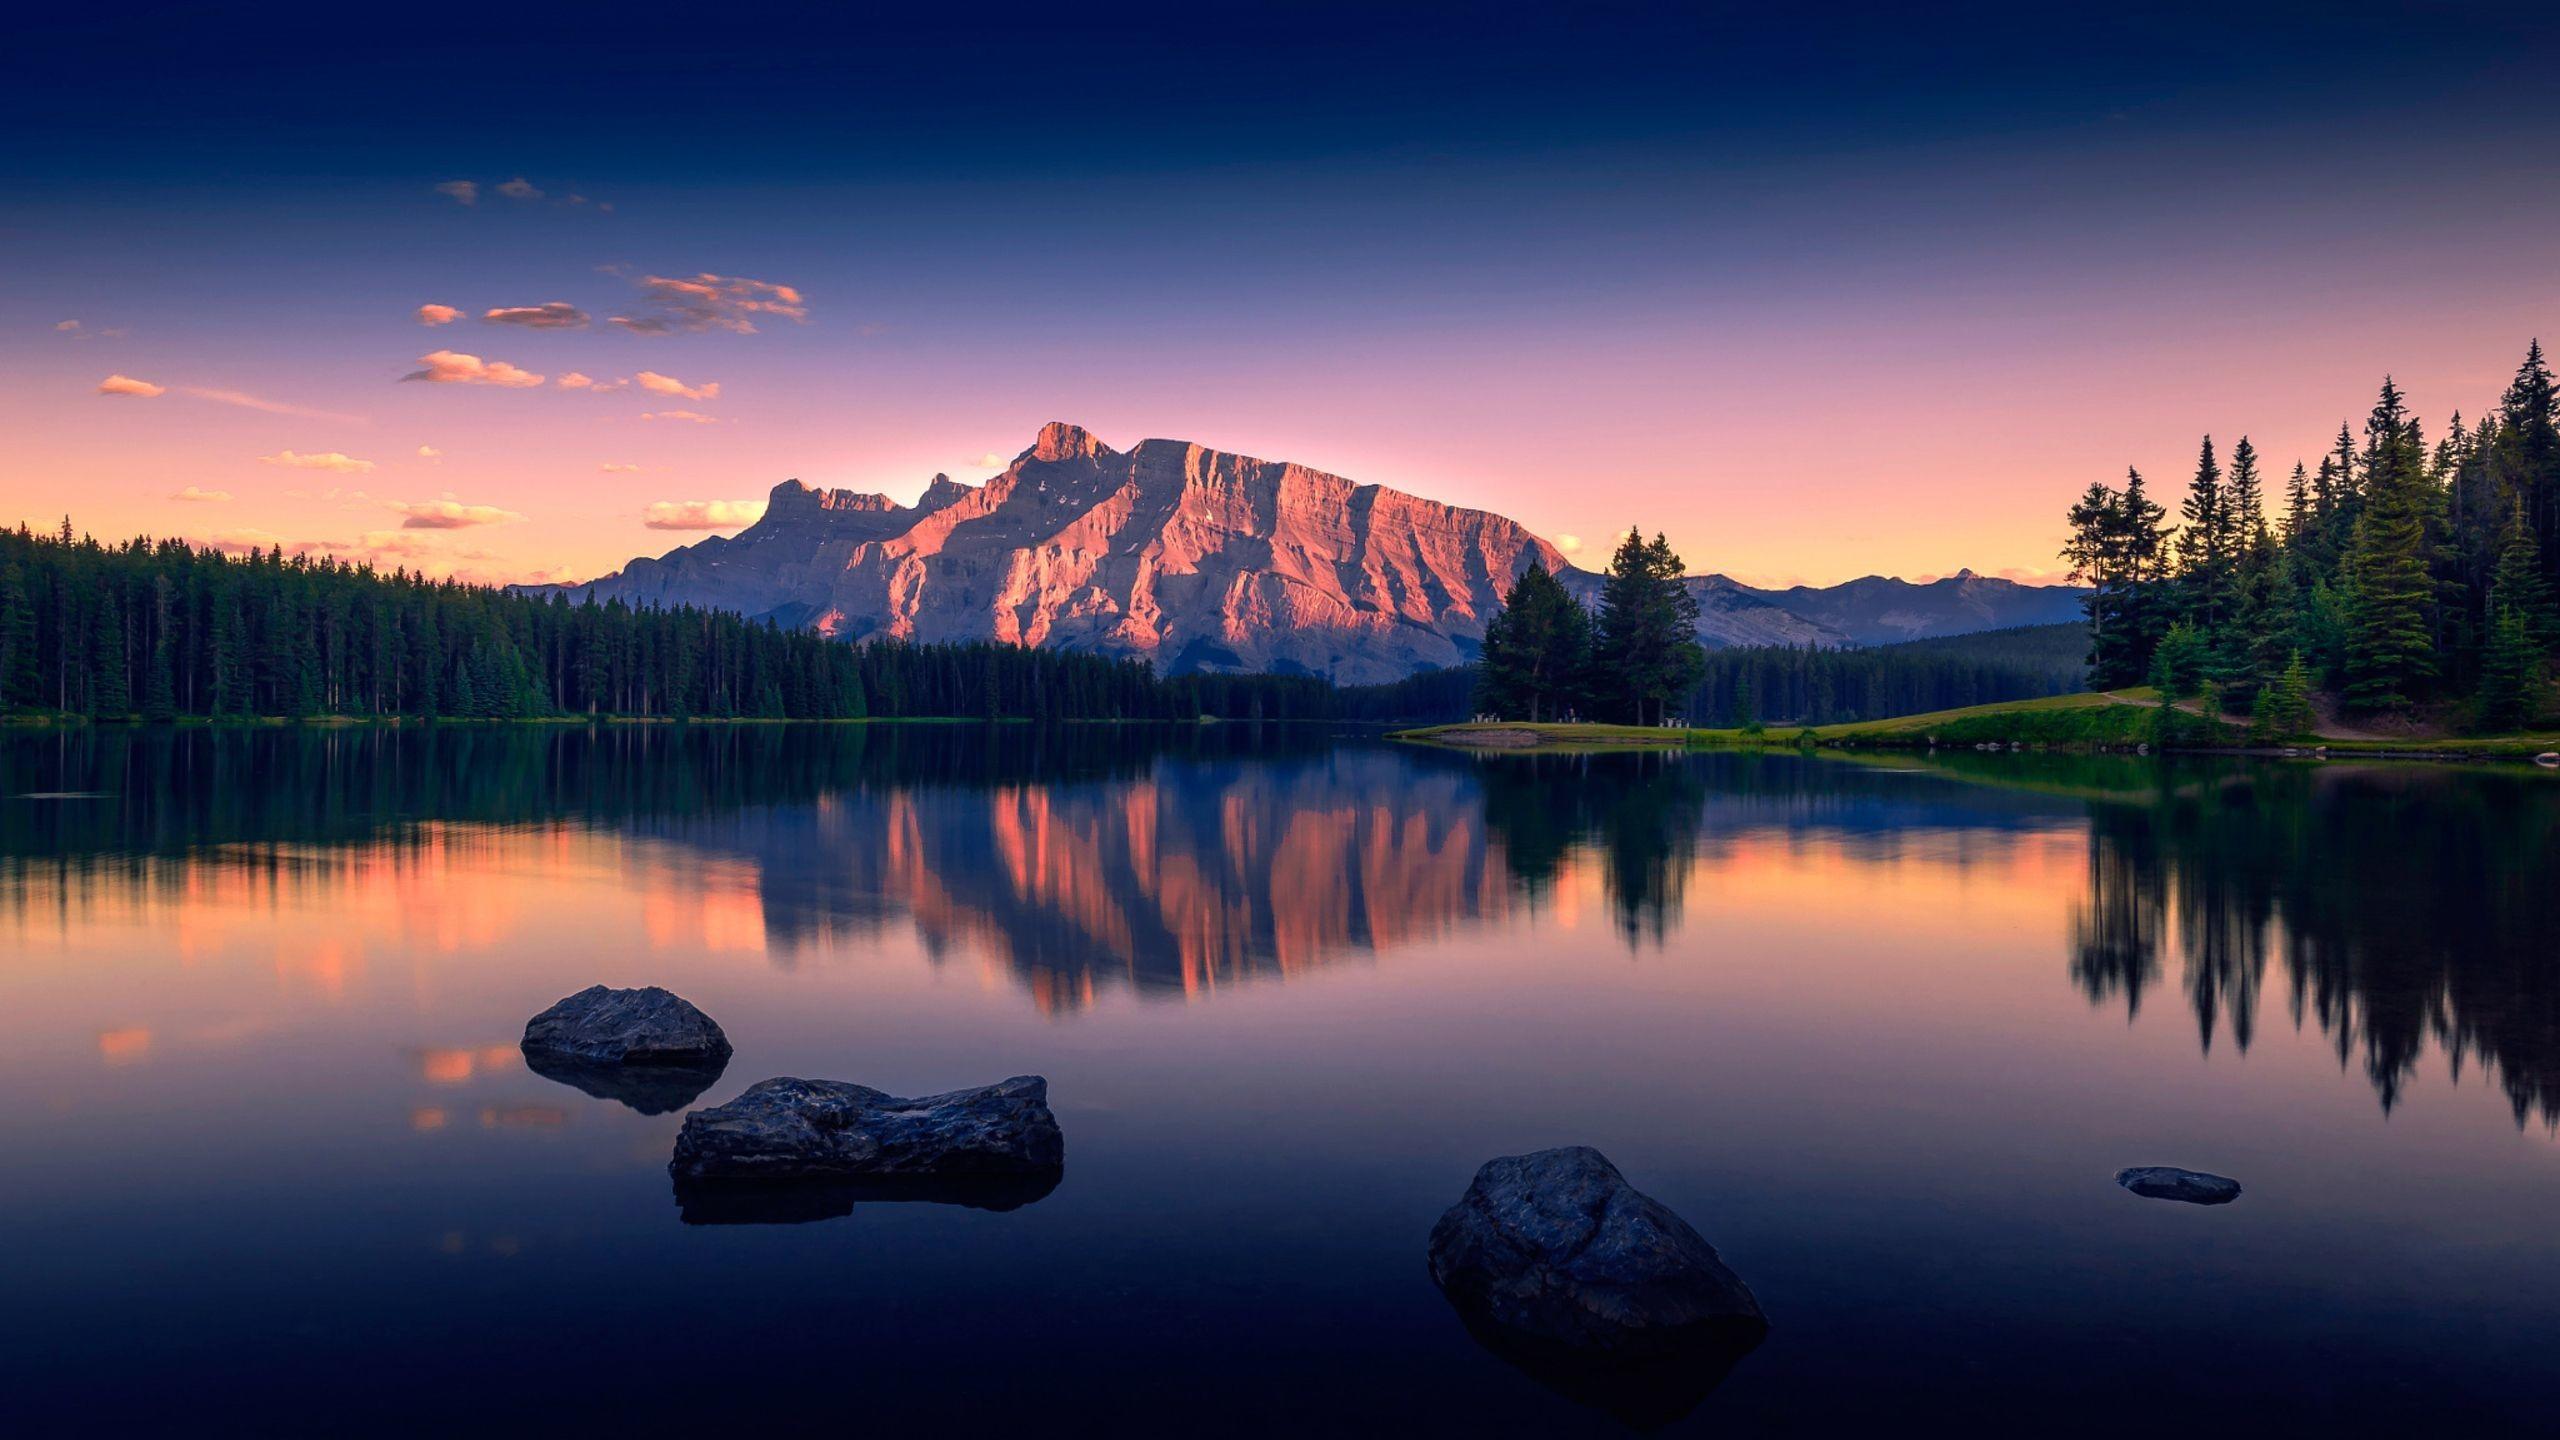 Res: 2560x1440,  wallpaper.wiki-Cool-Nature-Lake-2560-x-1440